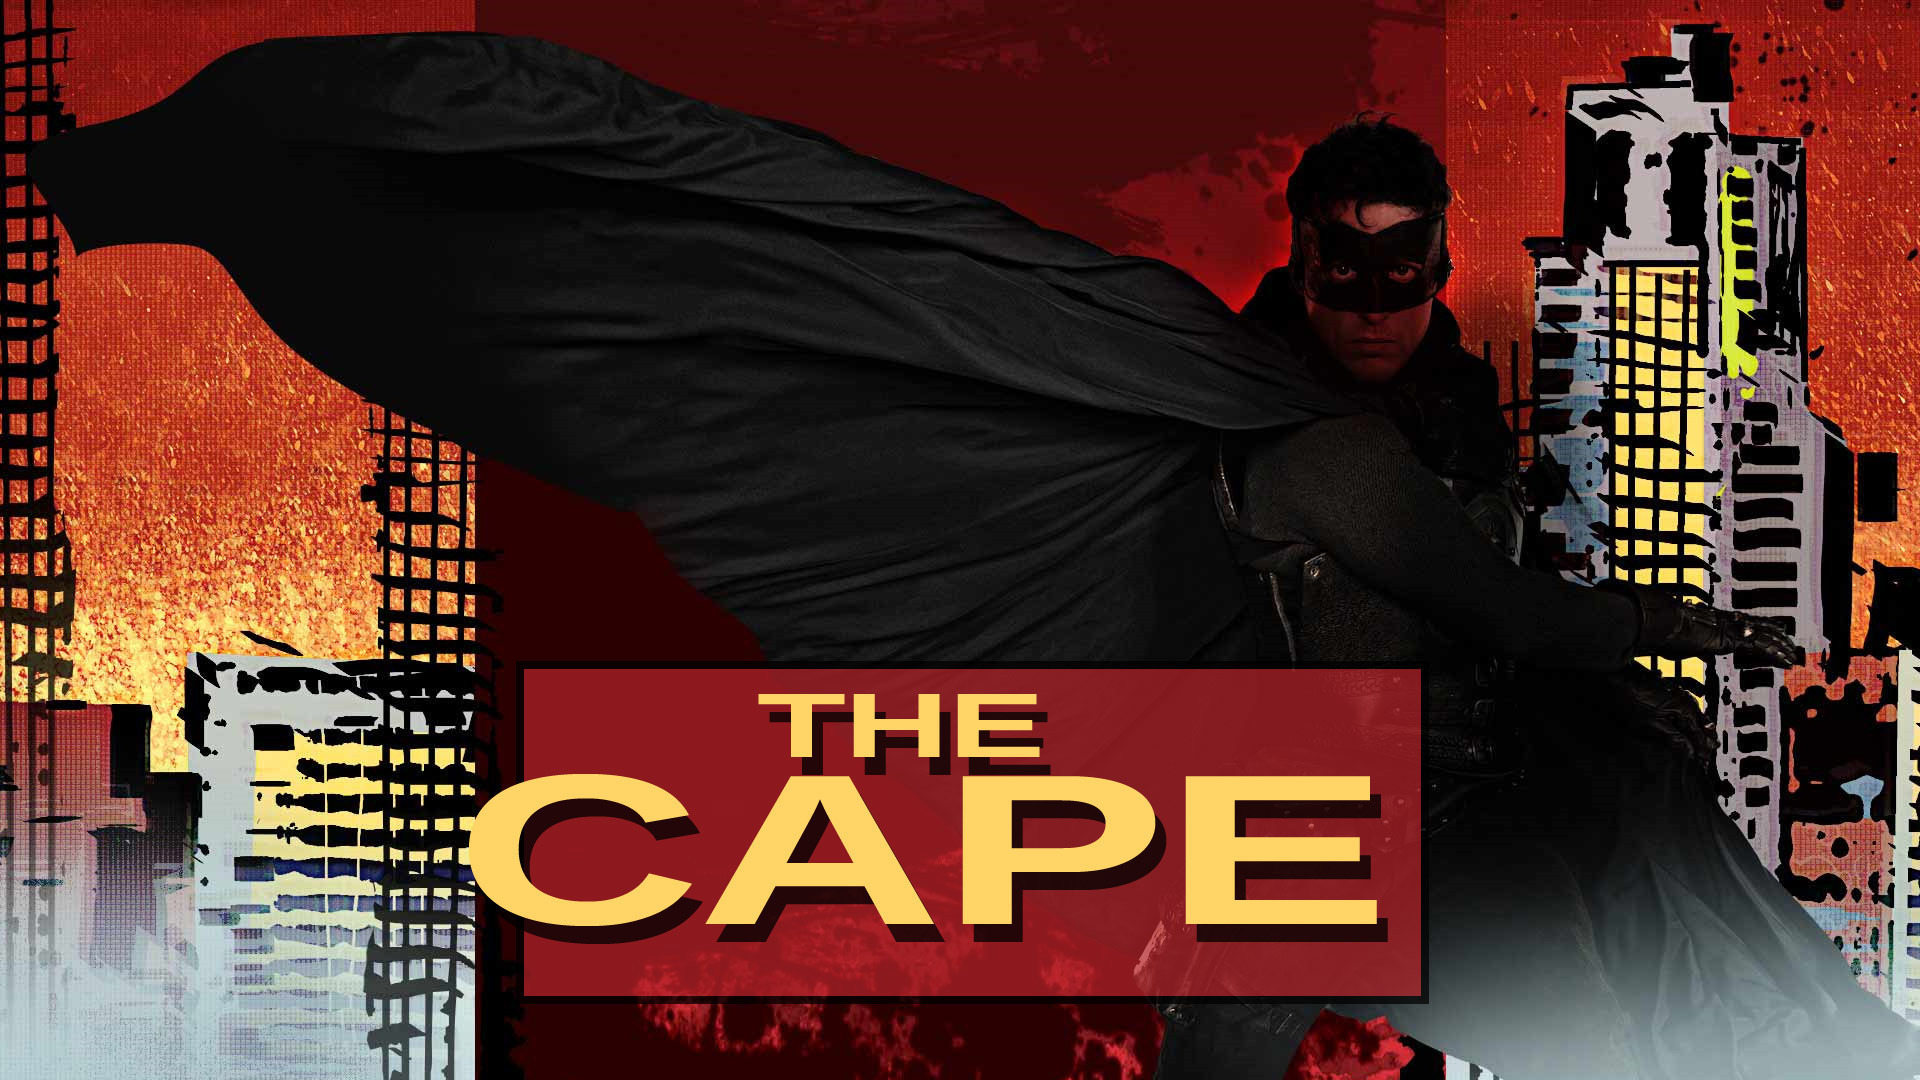 Show The Cape